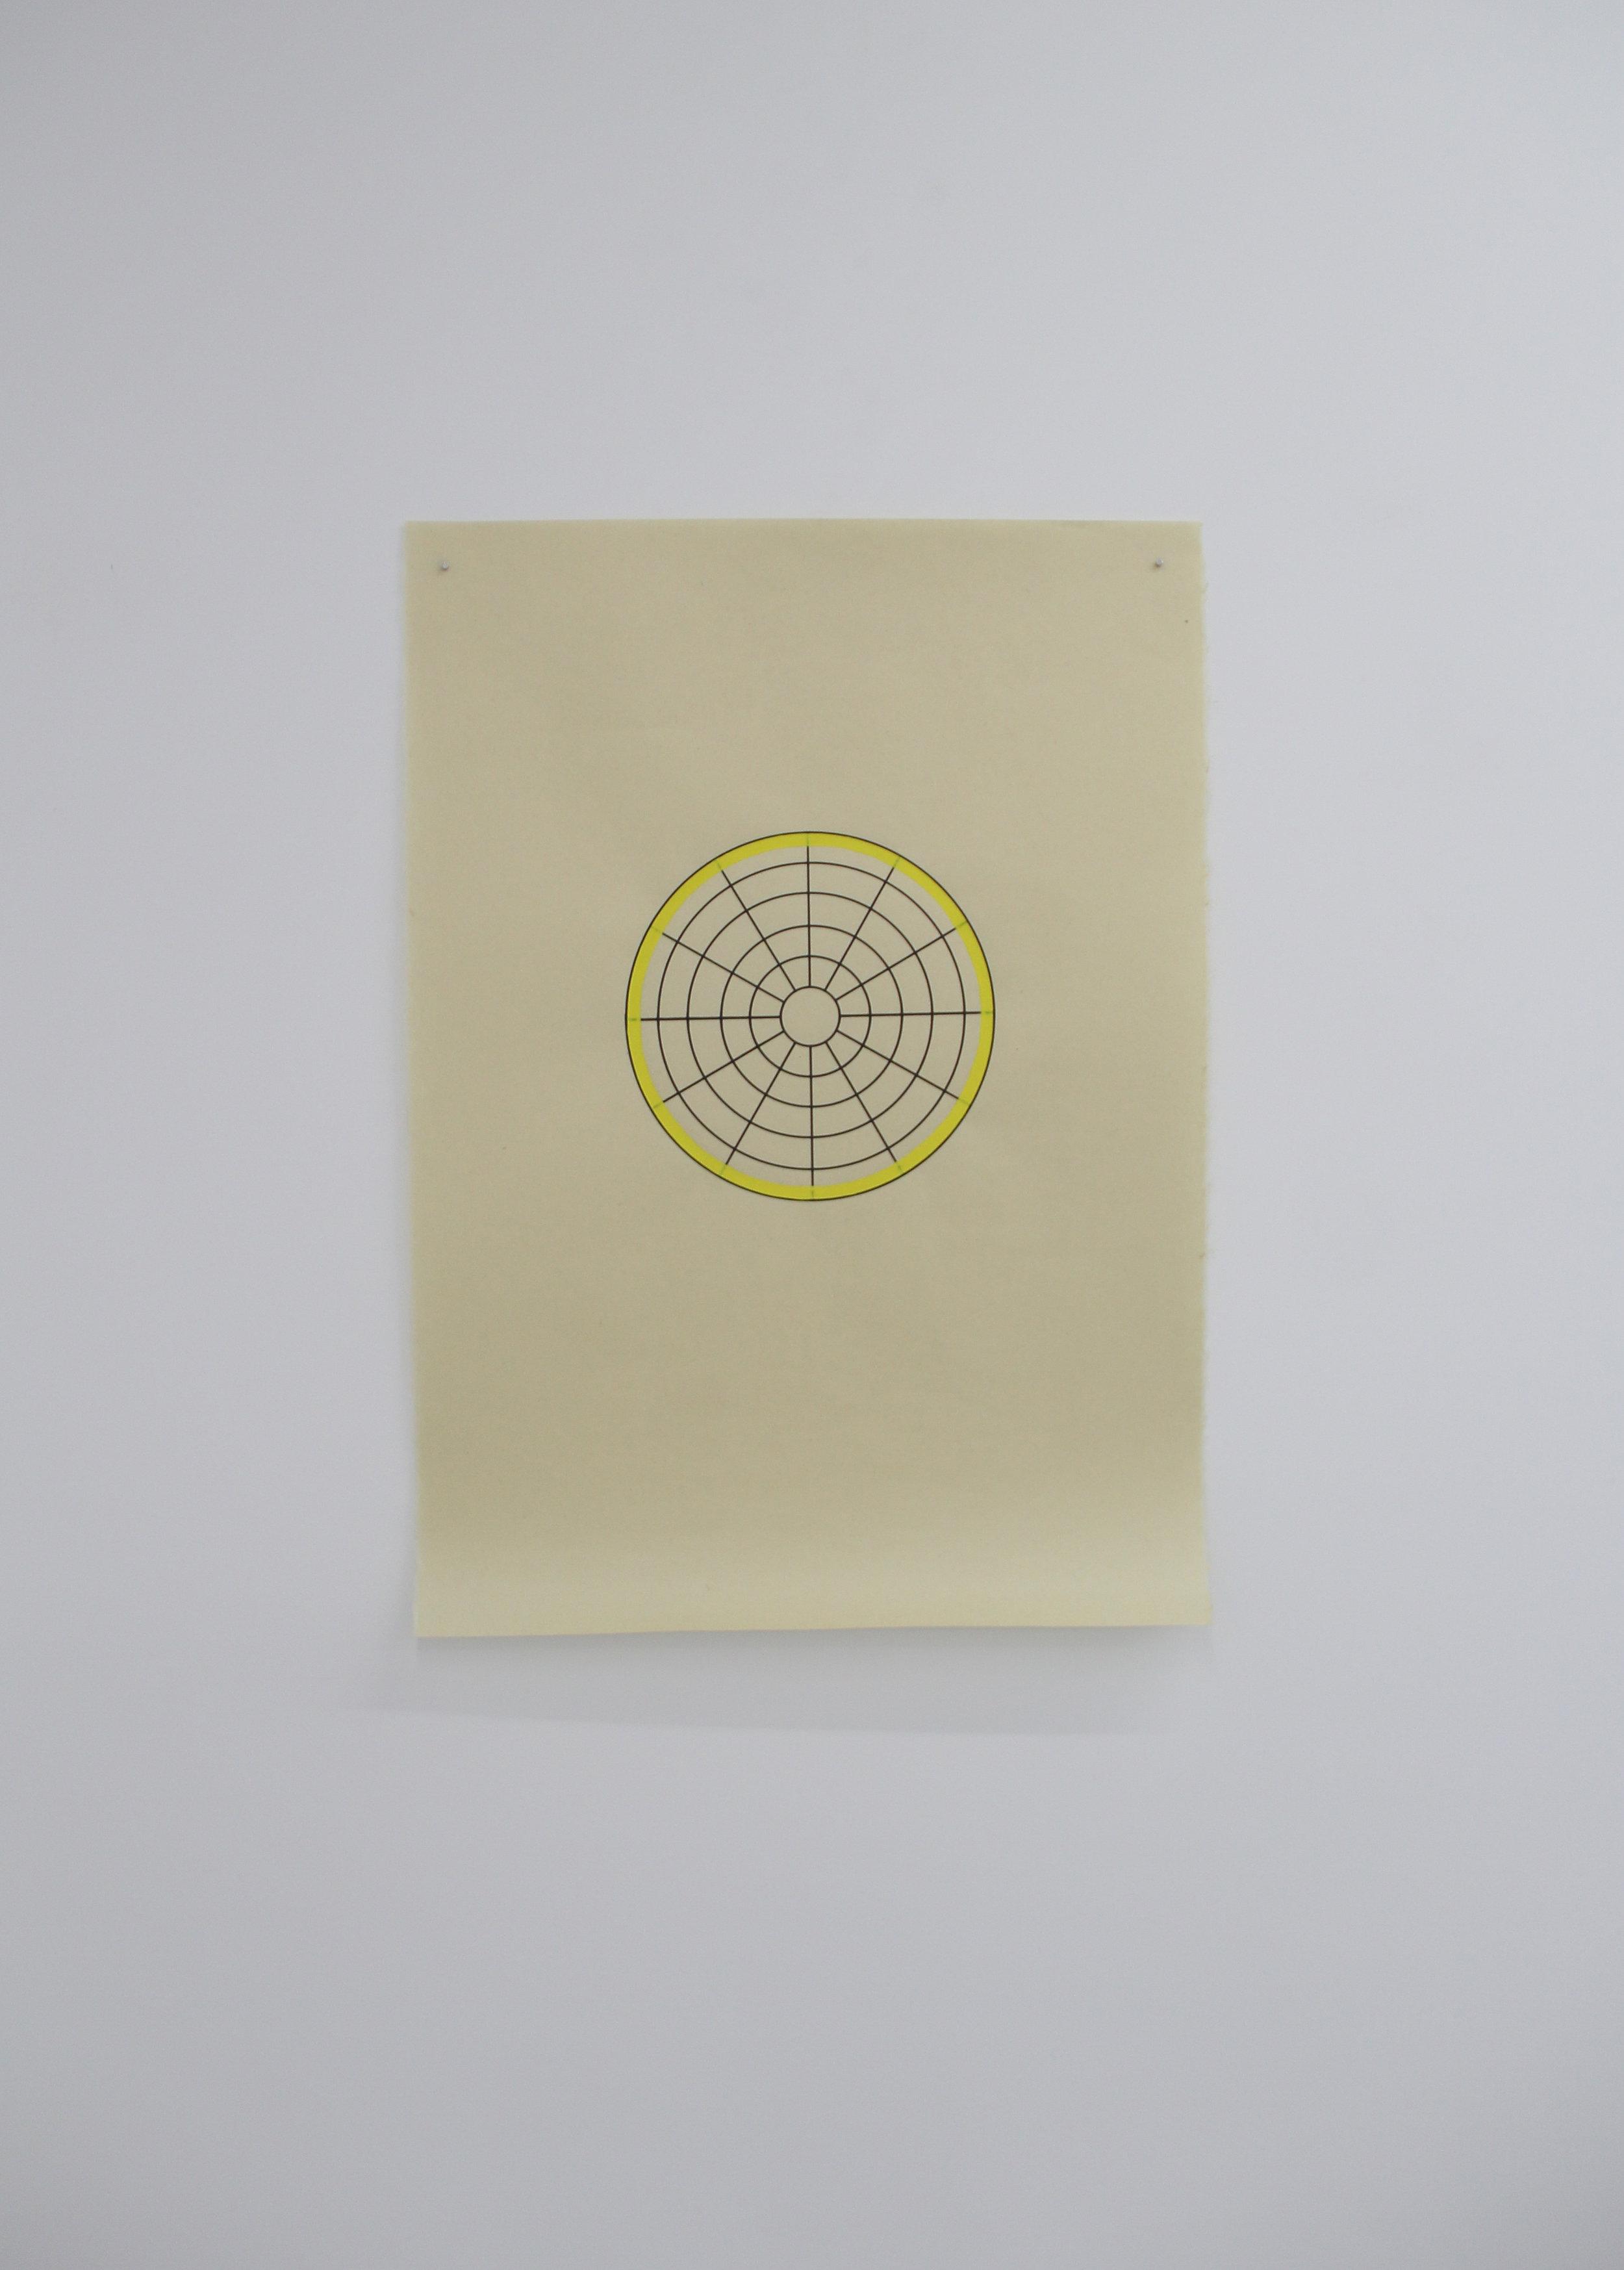 Antonin Gerson,  Jaune - Omnidirectionnel , sérigraphie, gouache, 58x84cm 2018